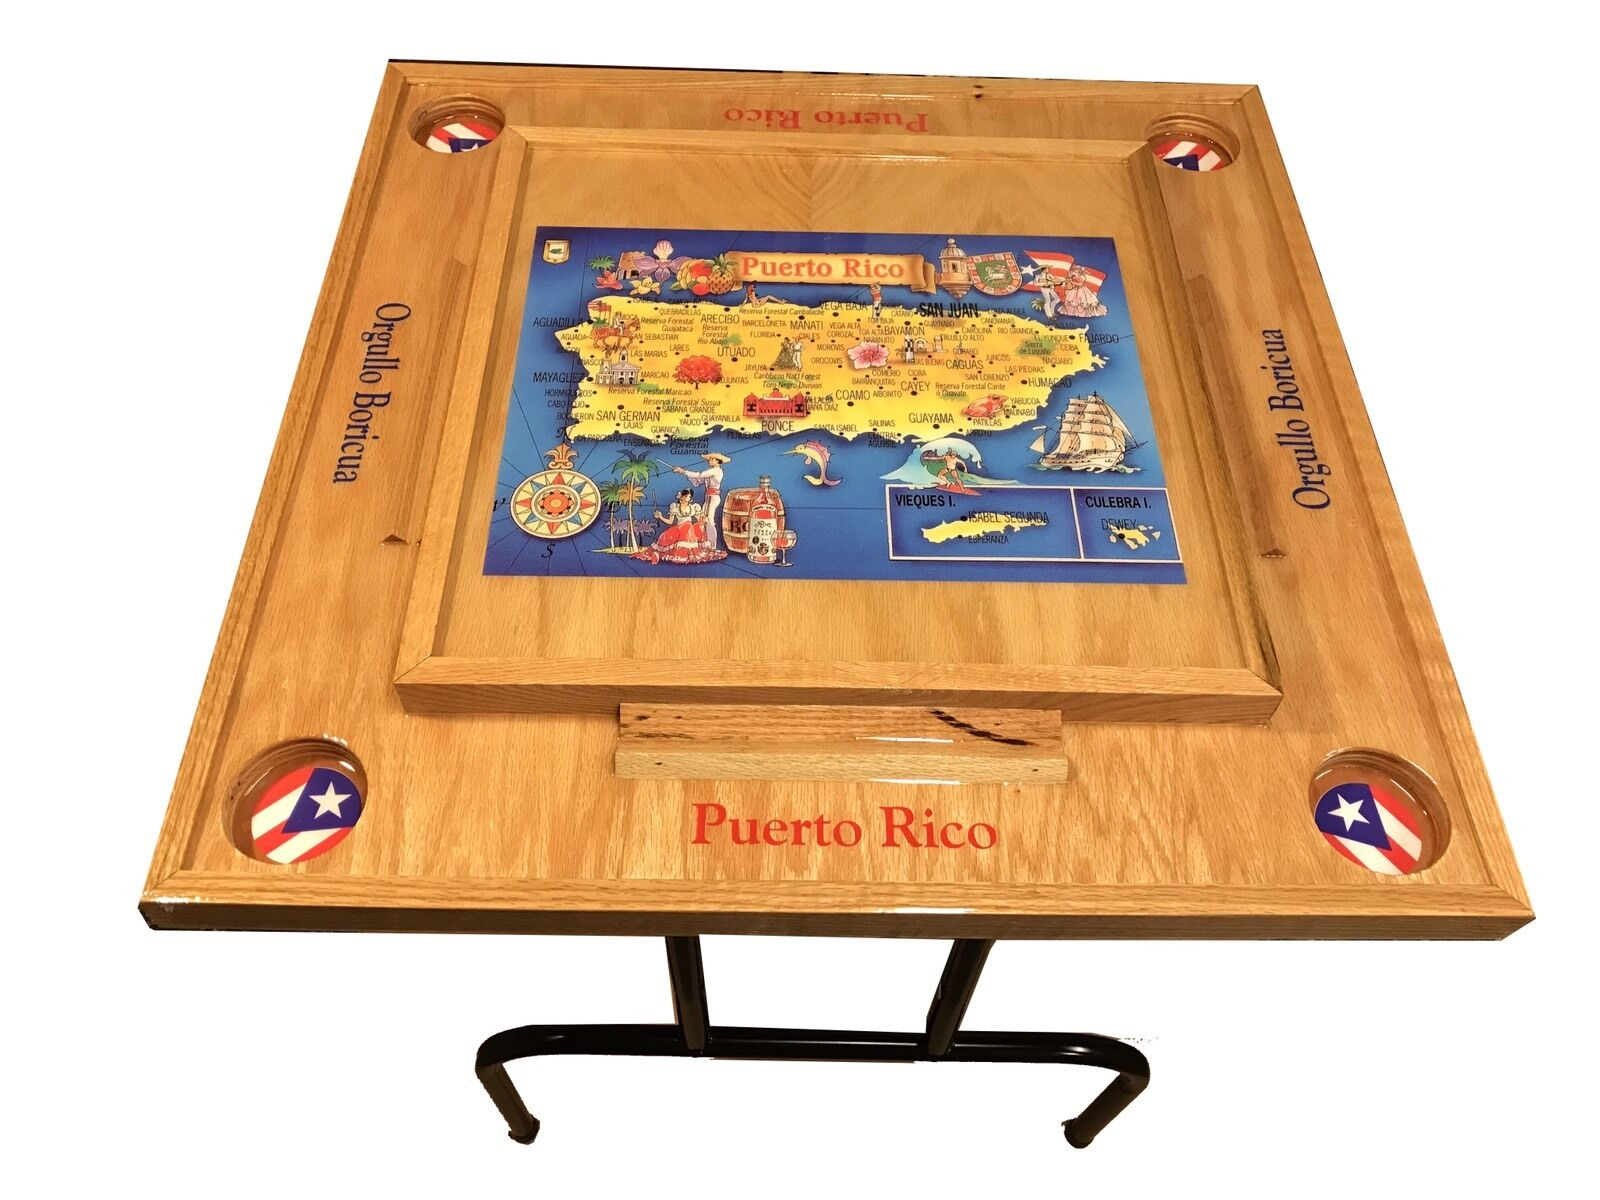 Puerto Rico Domino table avec la carte